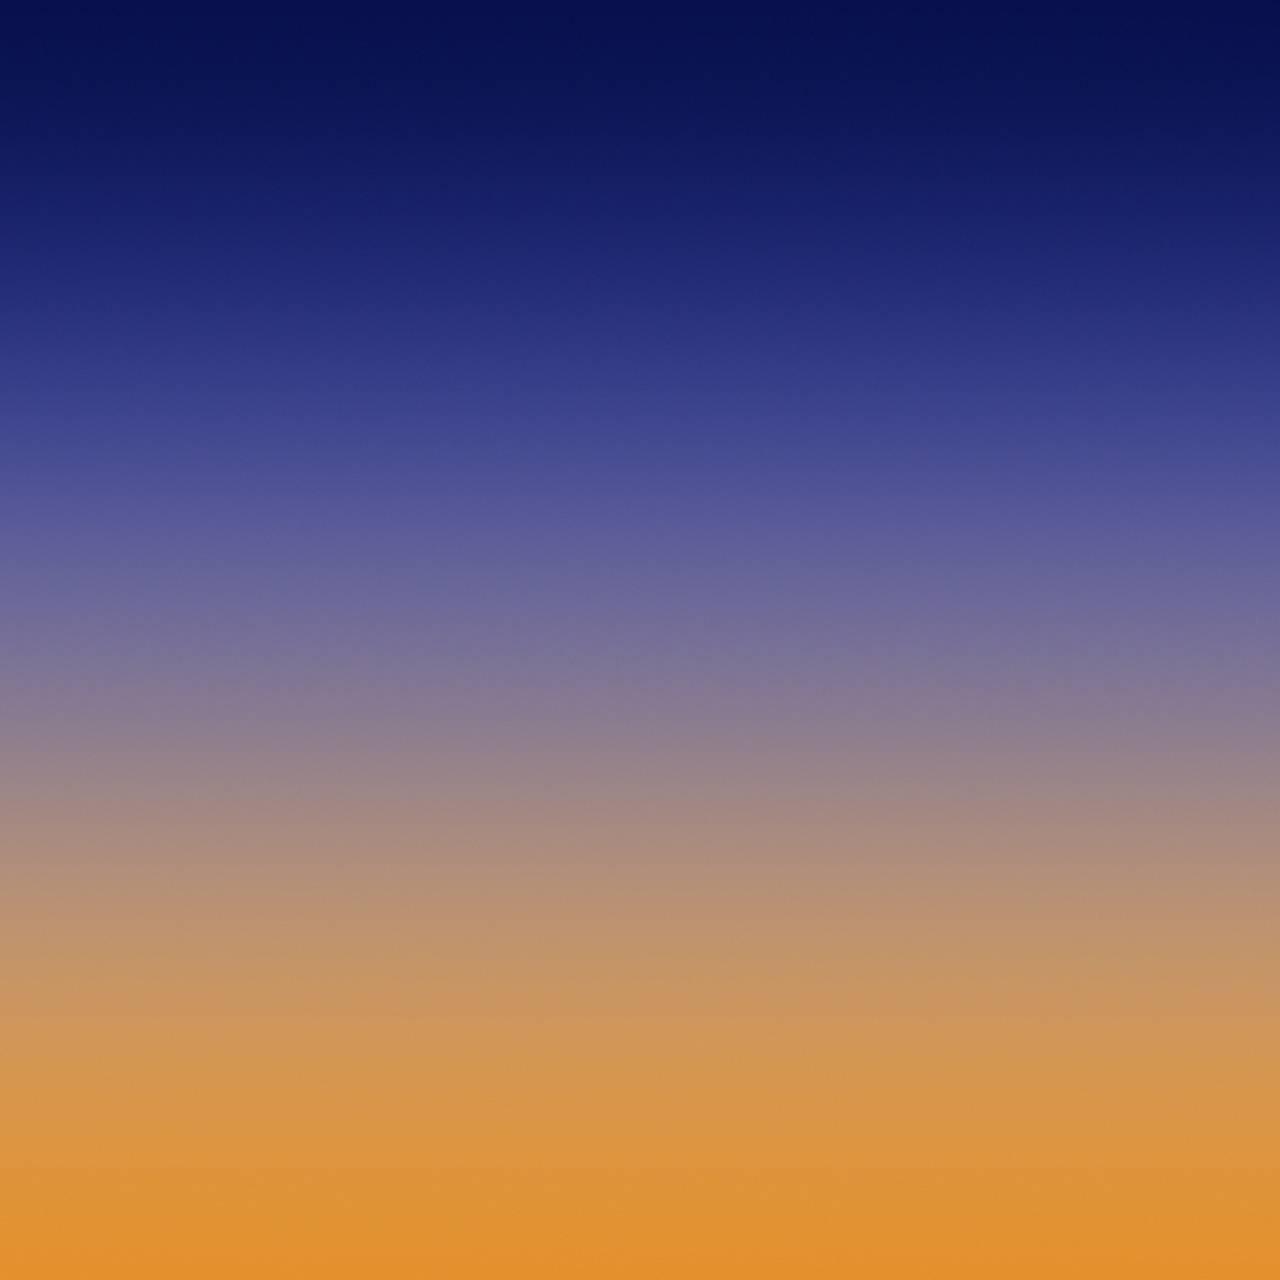 عکس زمینه گلکسی Note9 samsung آبی قهوه ای پس زمینه